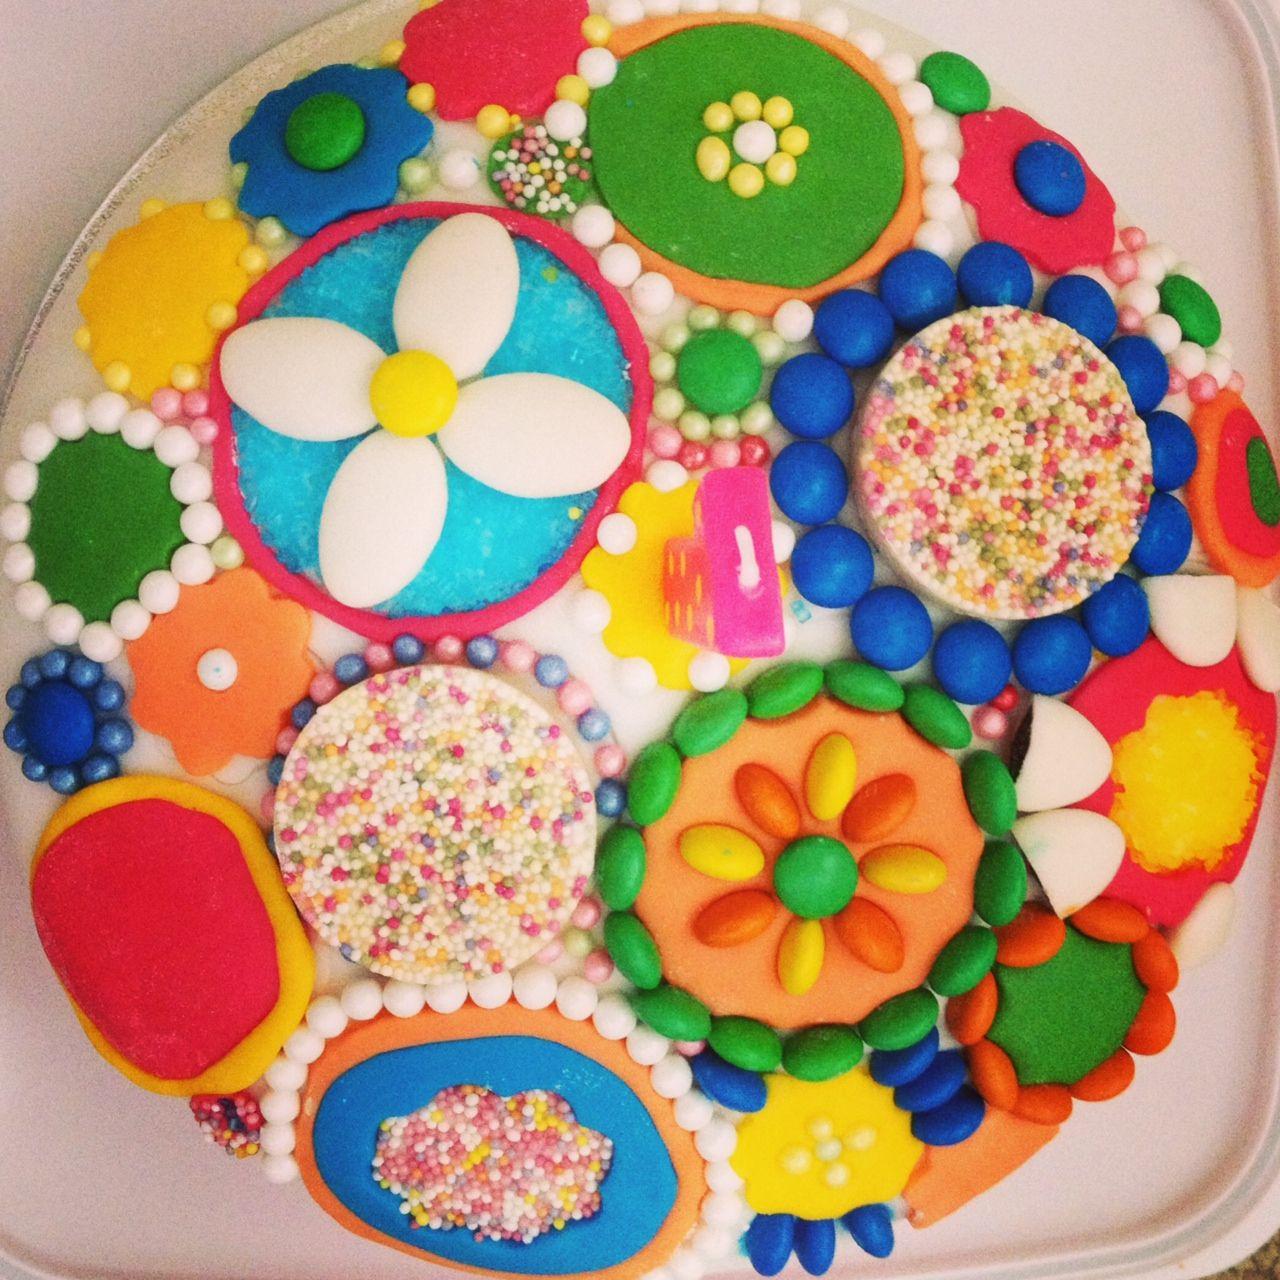 concentrical cake design